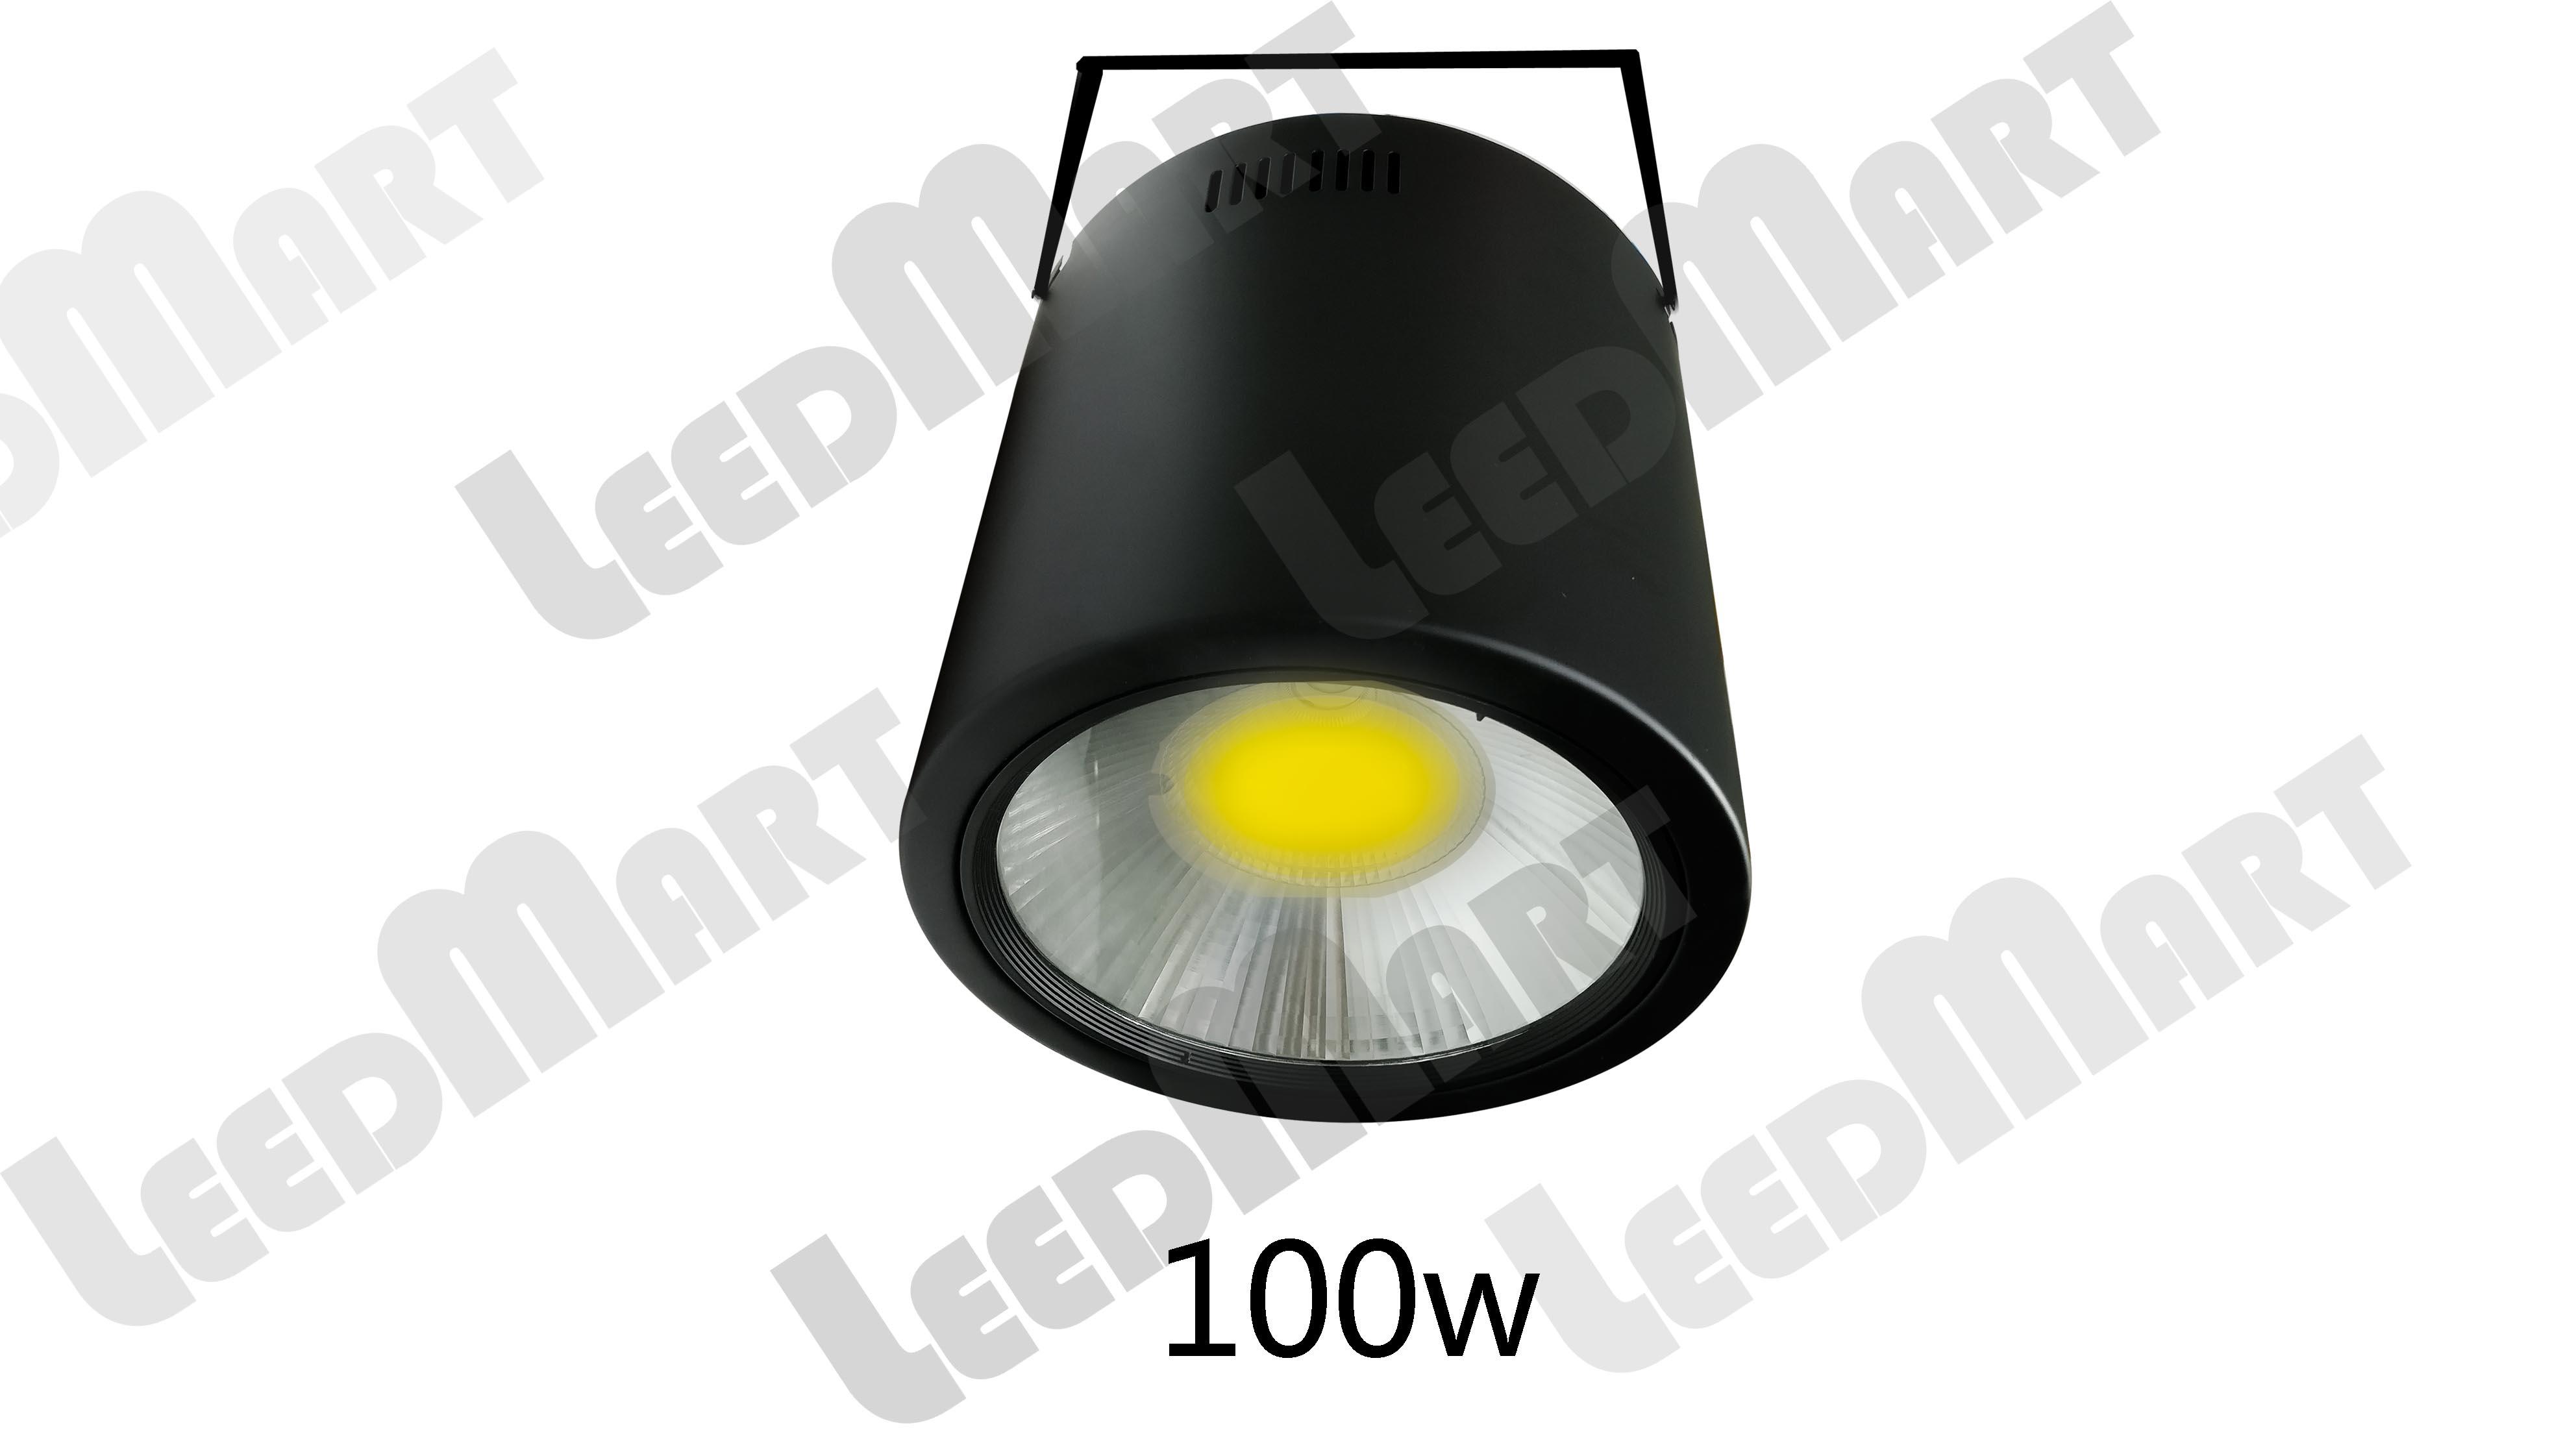 100 watt-400 watt 52000 lumen equivalent white integrated LED round high bay ceiling light fixture dustproof